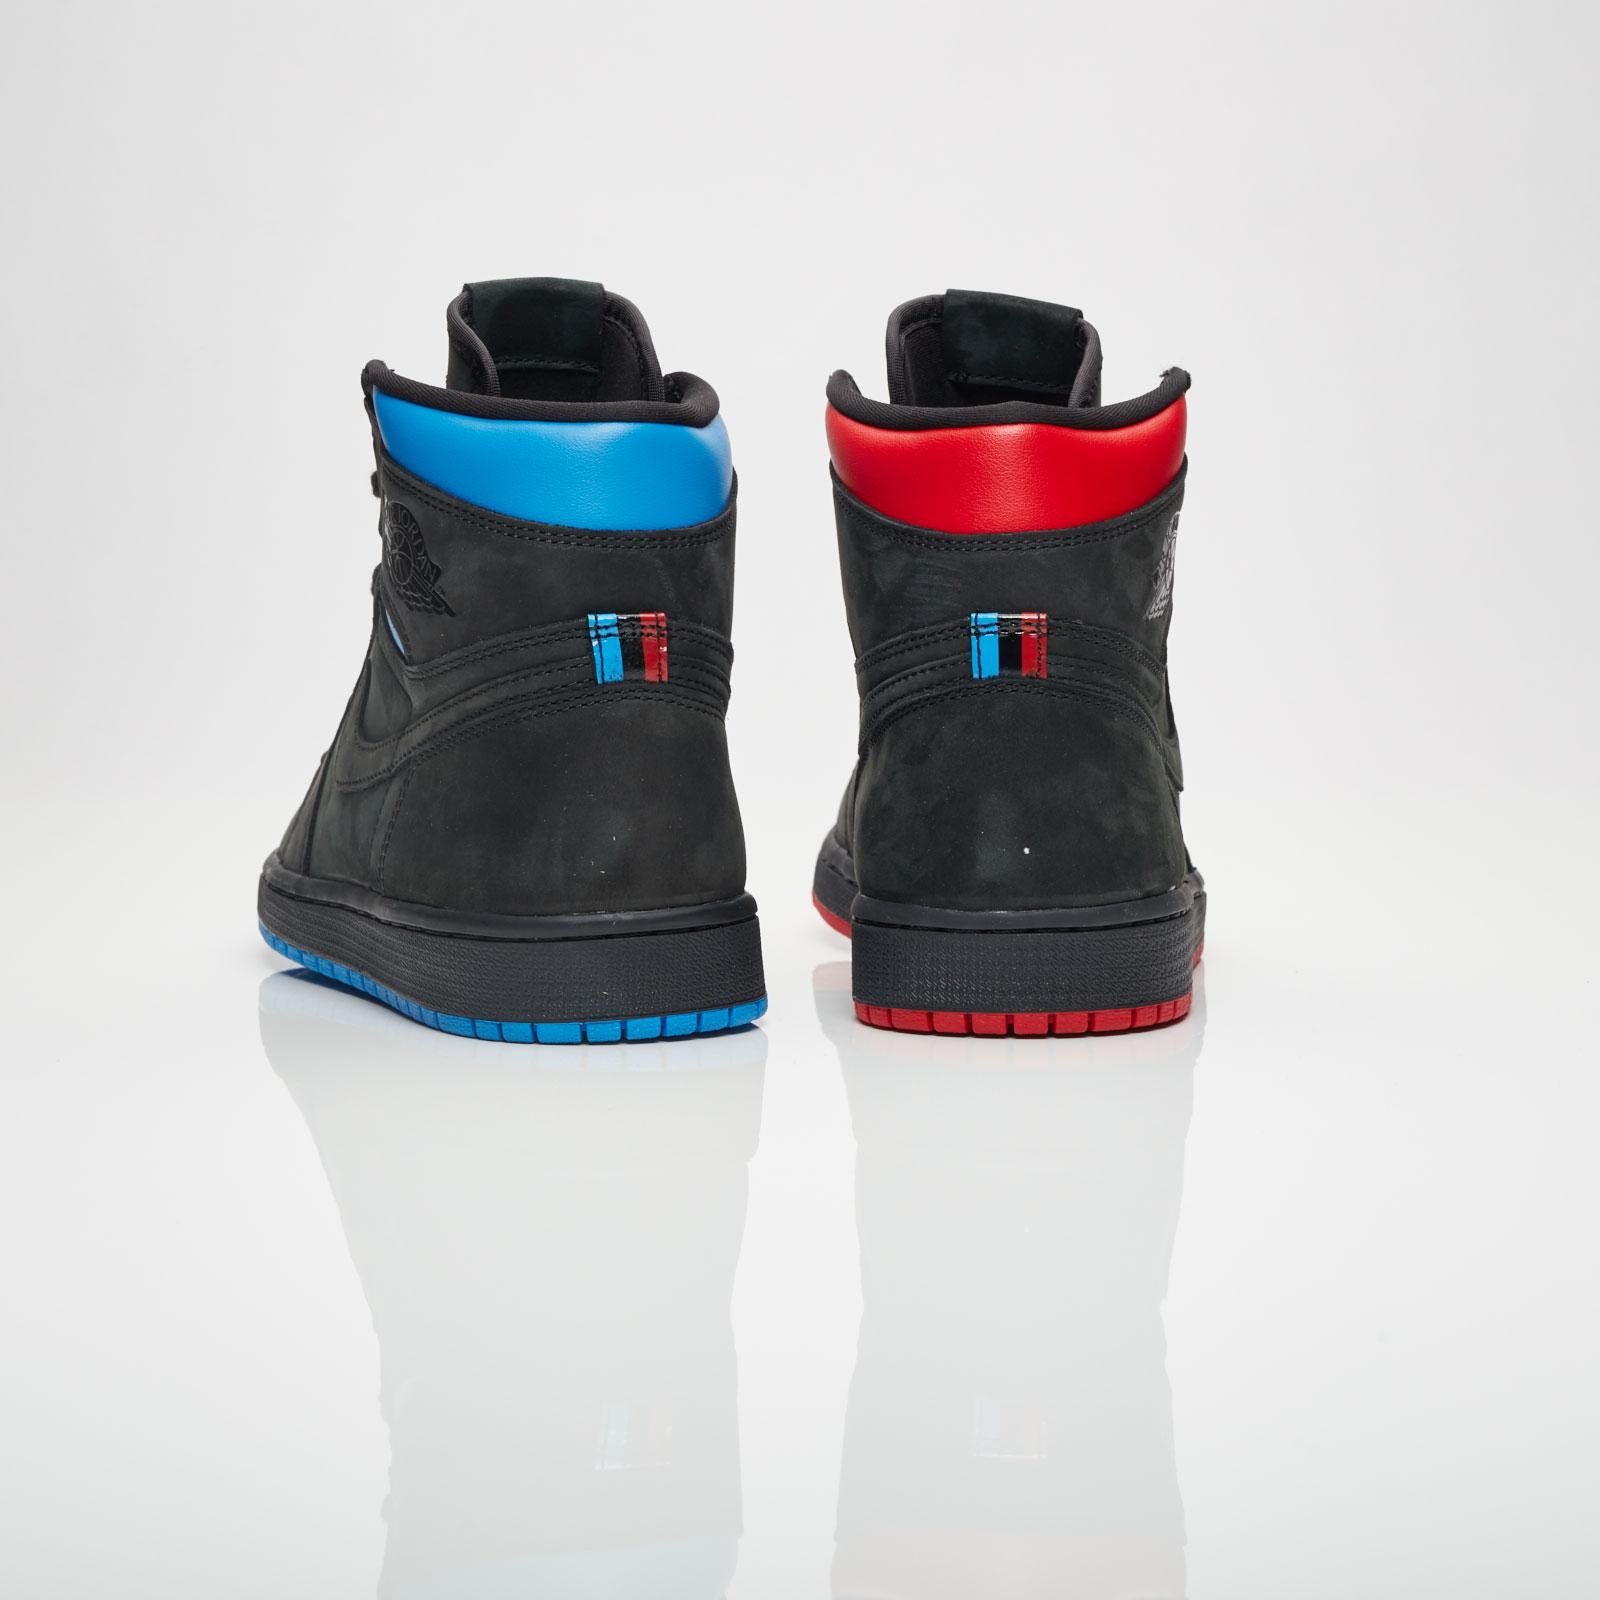 sale retailer 338d9 23189 Jordan Brand Air Jordan 1 Retro High OG Q54 - Ah1040-054 ...